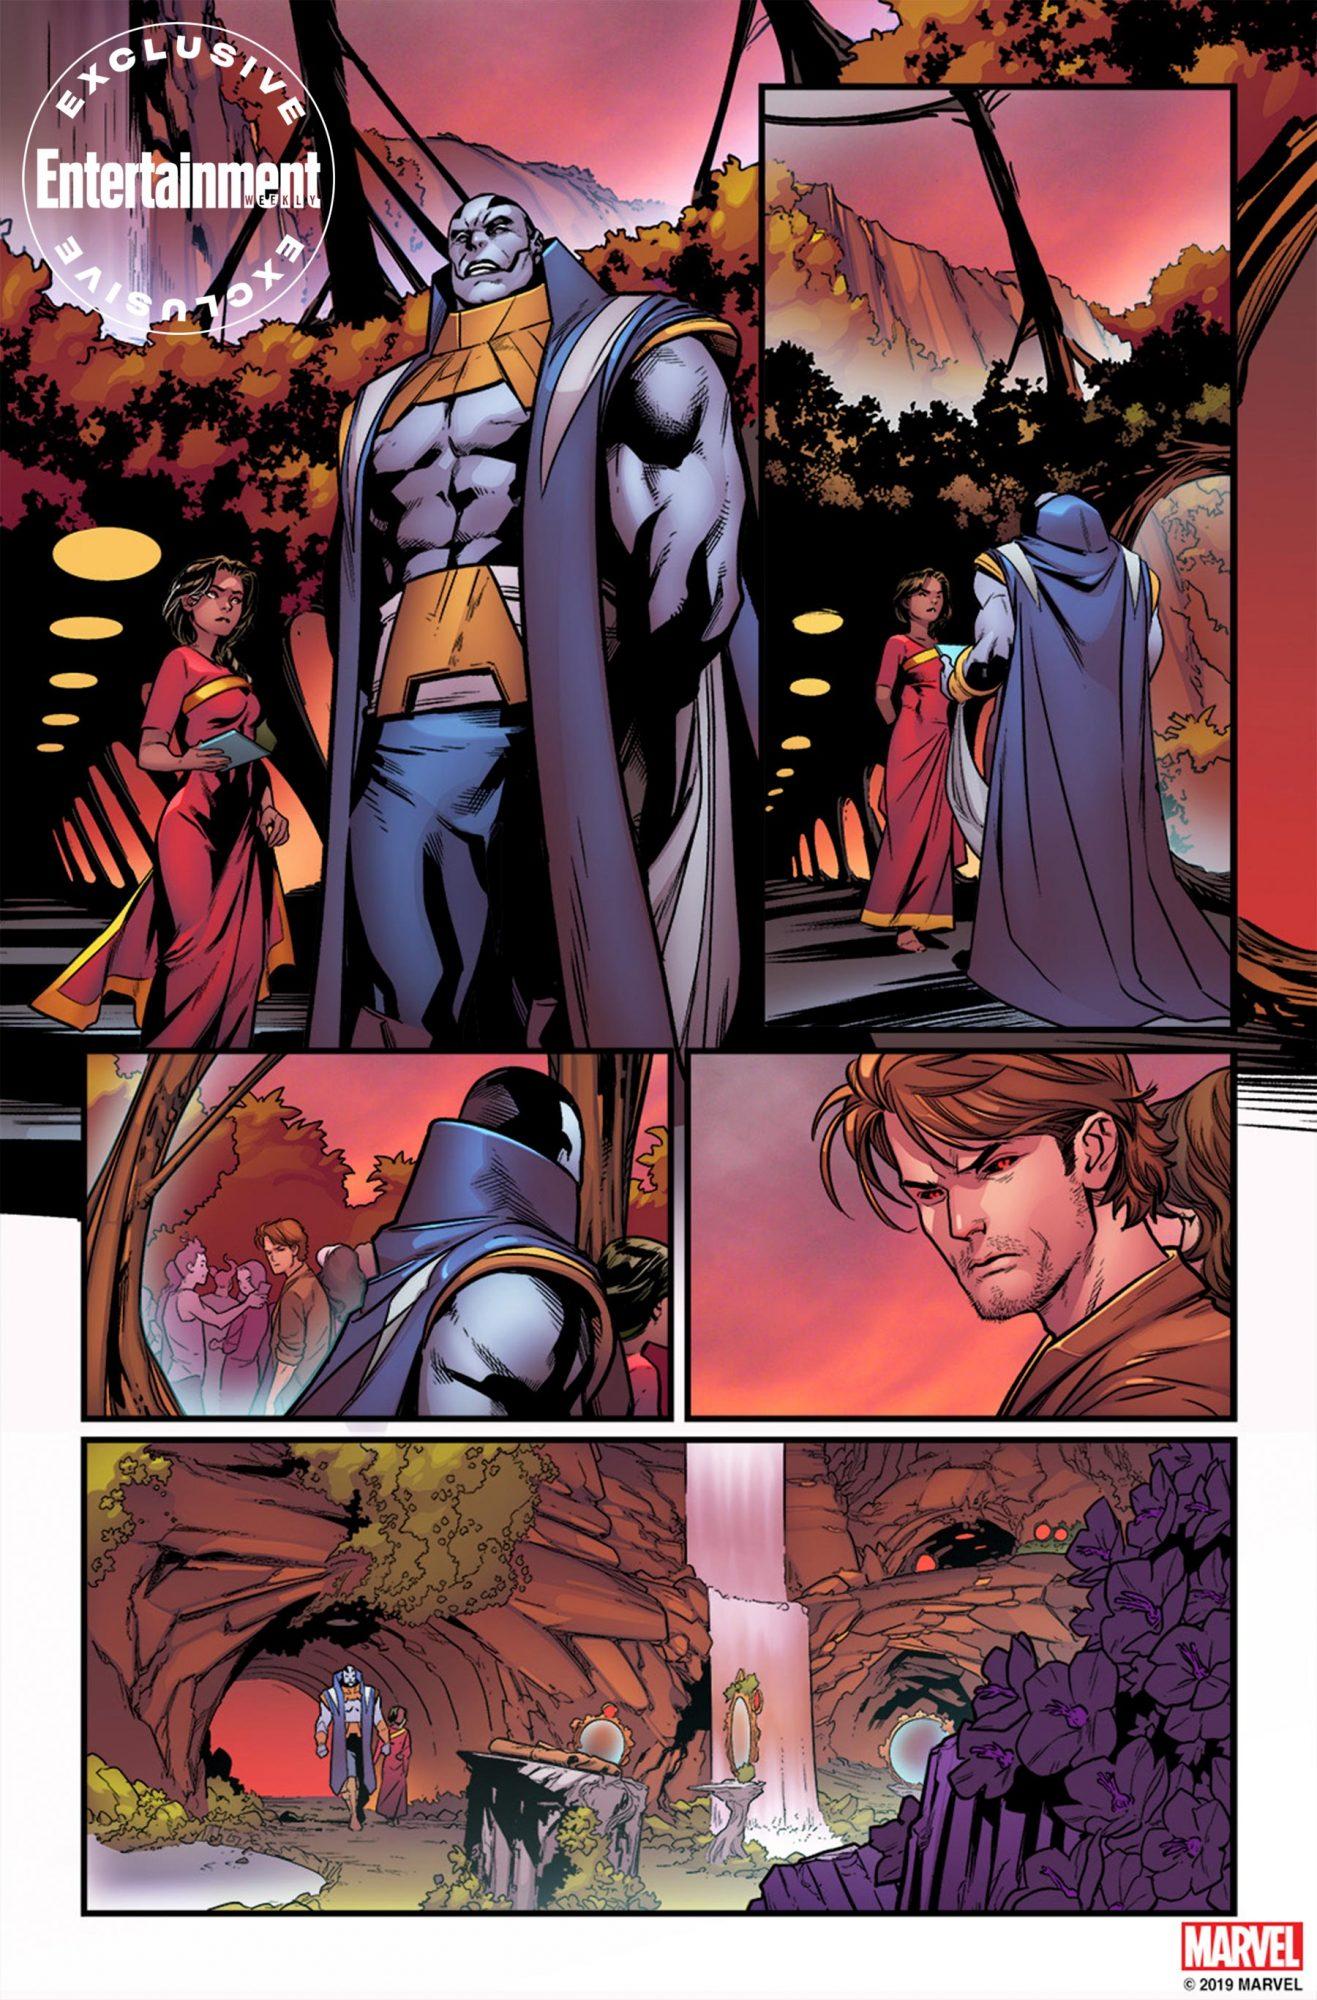 Excalibur comicMarcus To for Marvel Comics